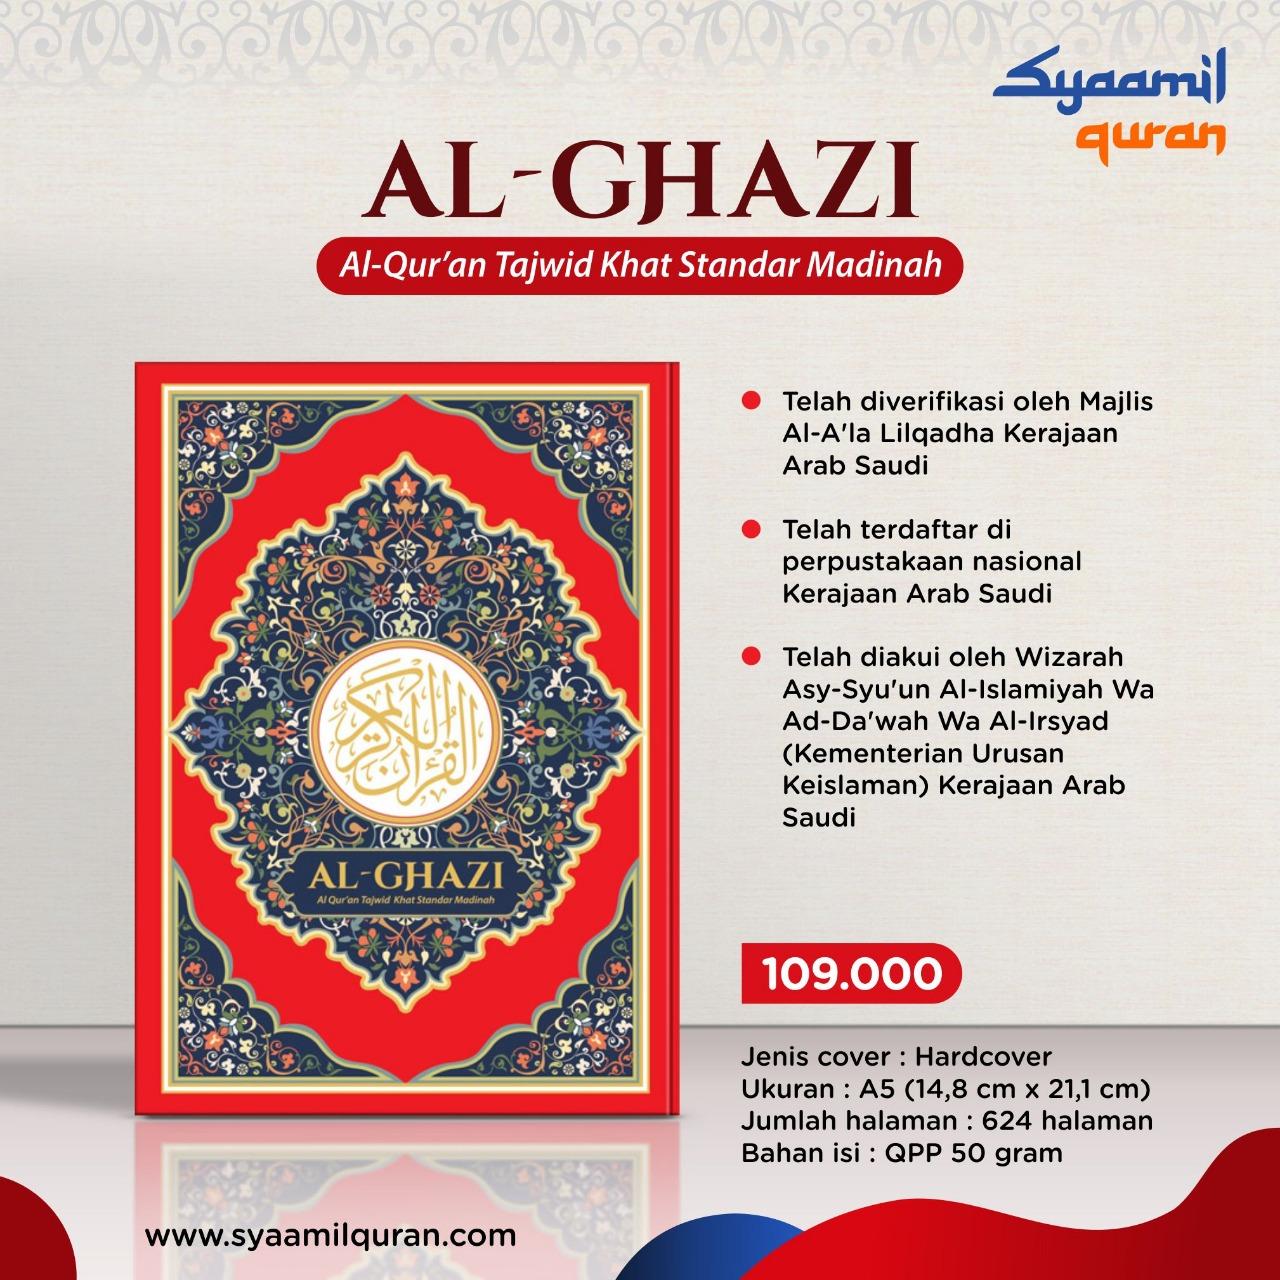 Jual Al-Qur'an Syamil Al-Ghazi: Al-Qur'an Tajwid Dengan Khat Standar Madinah